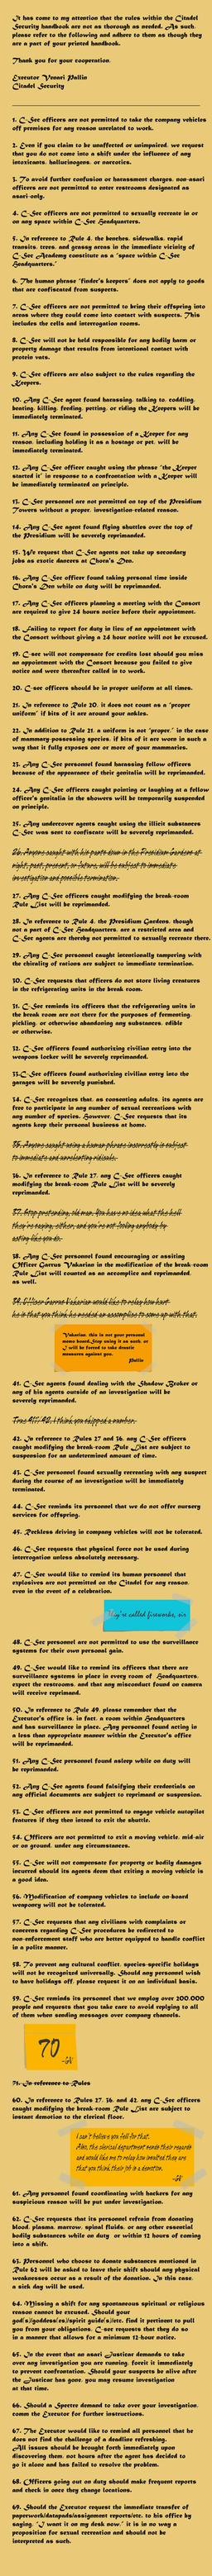 C-Sec Break Room Rules (69 rule challenge) by greenmamba5